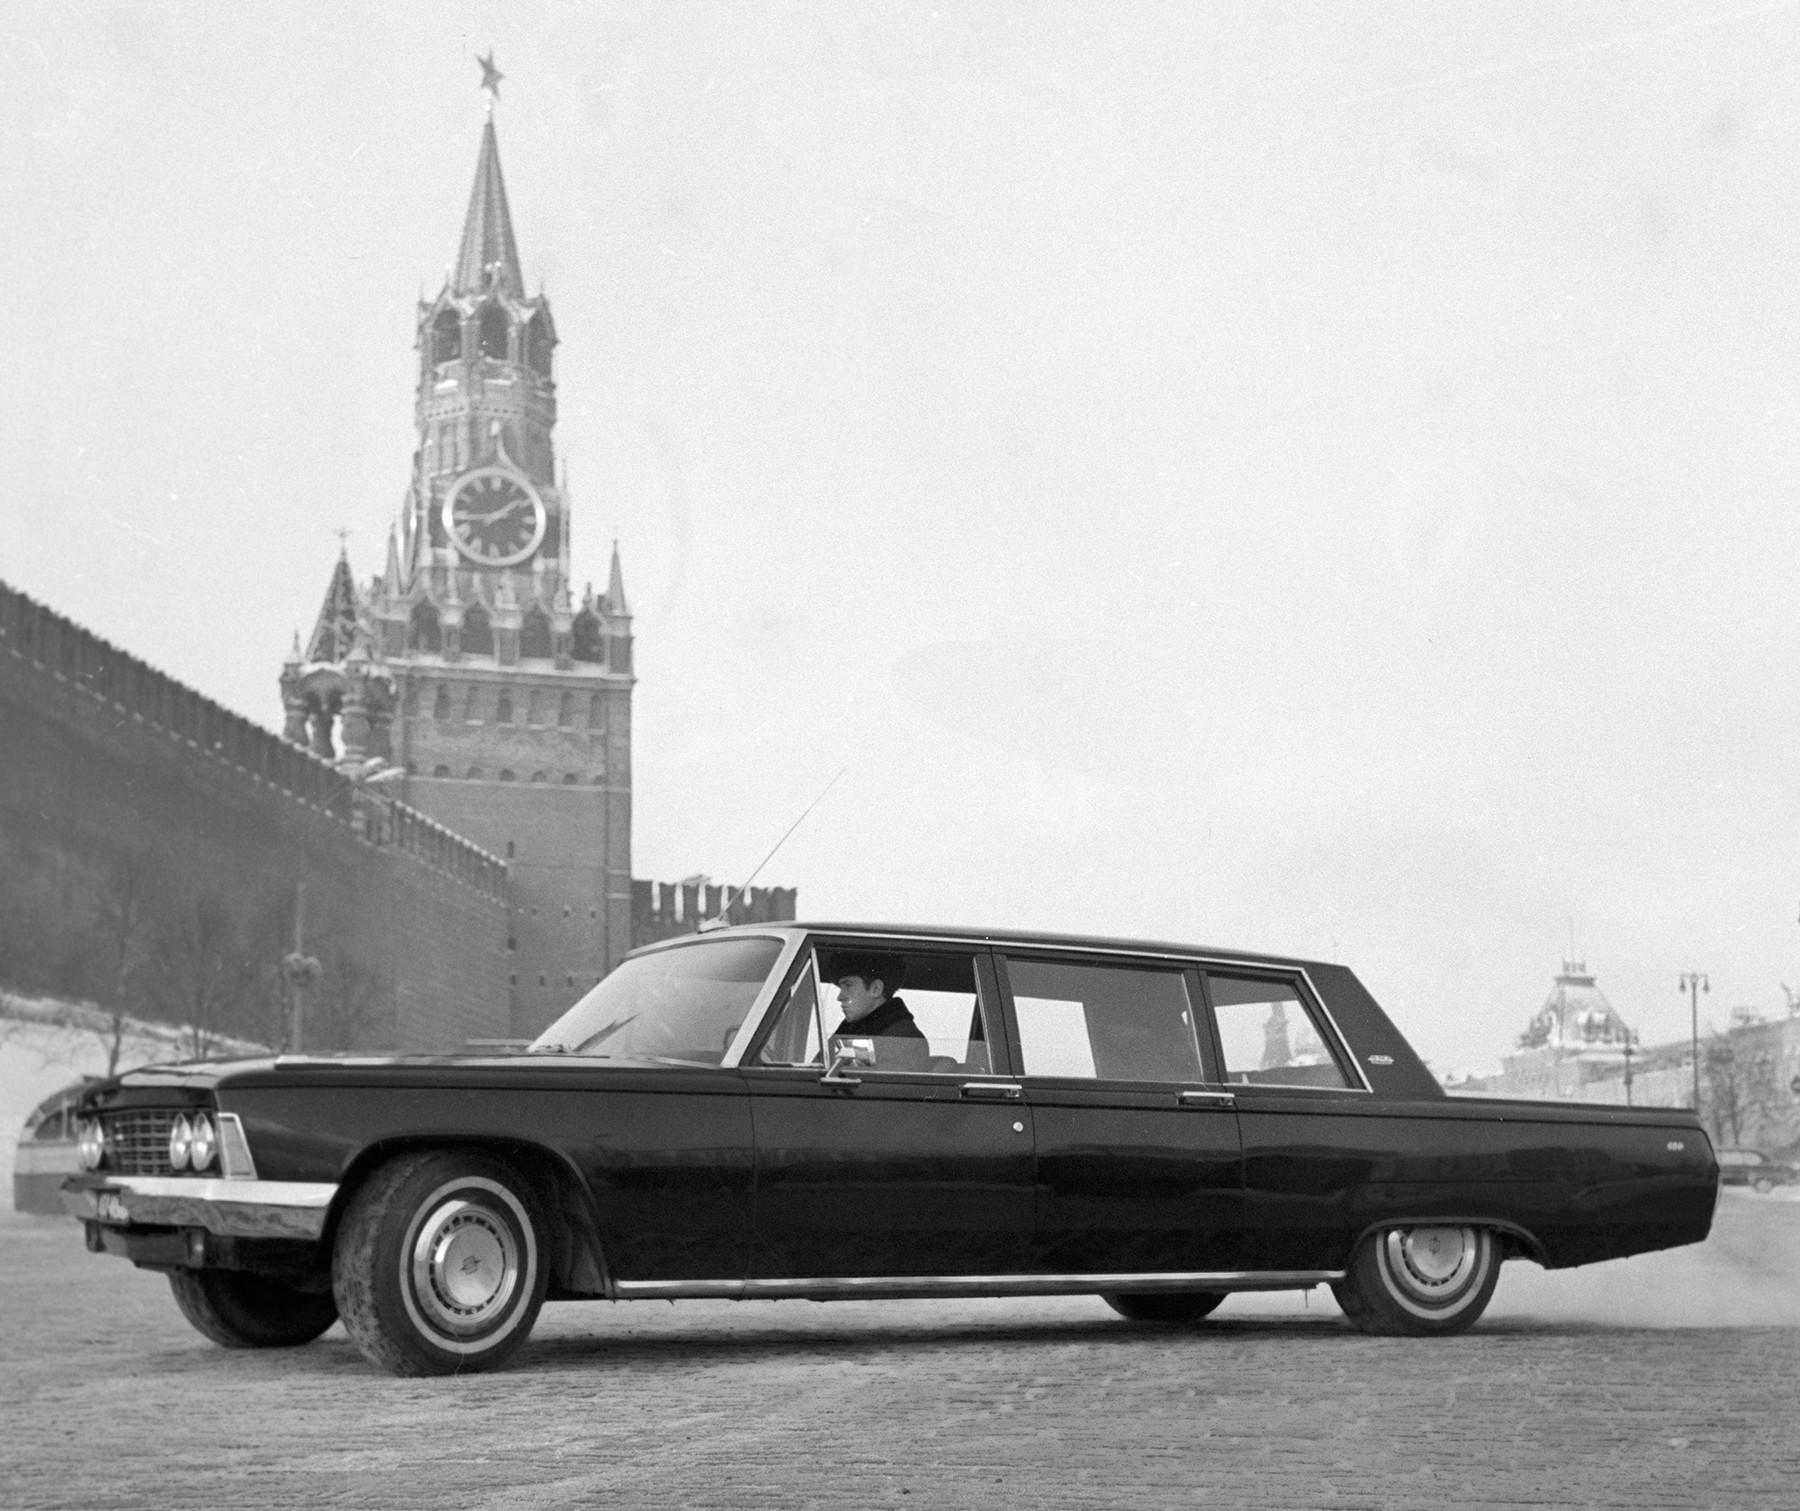 ZiL-114 en la Plaza Roja, 1968.